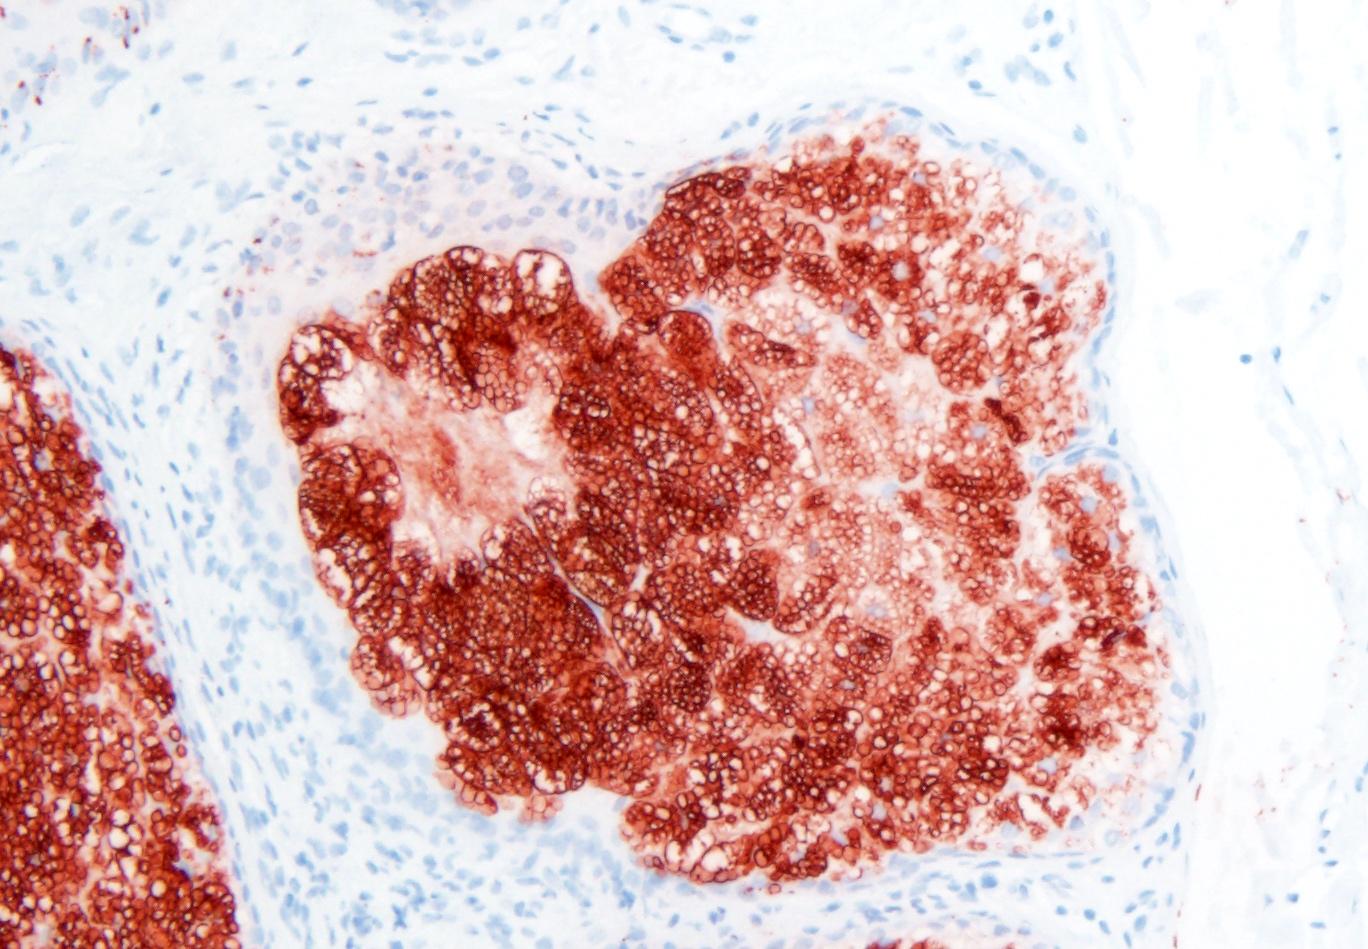 Adipophilin+ sebaceous gland